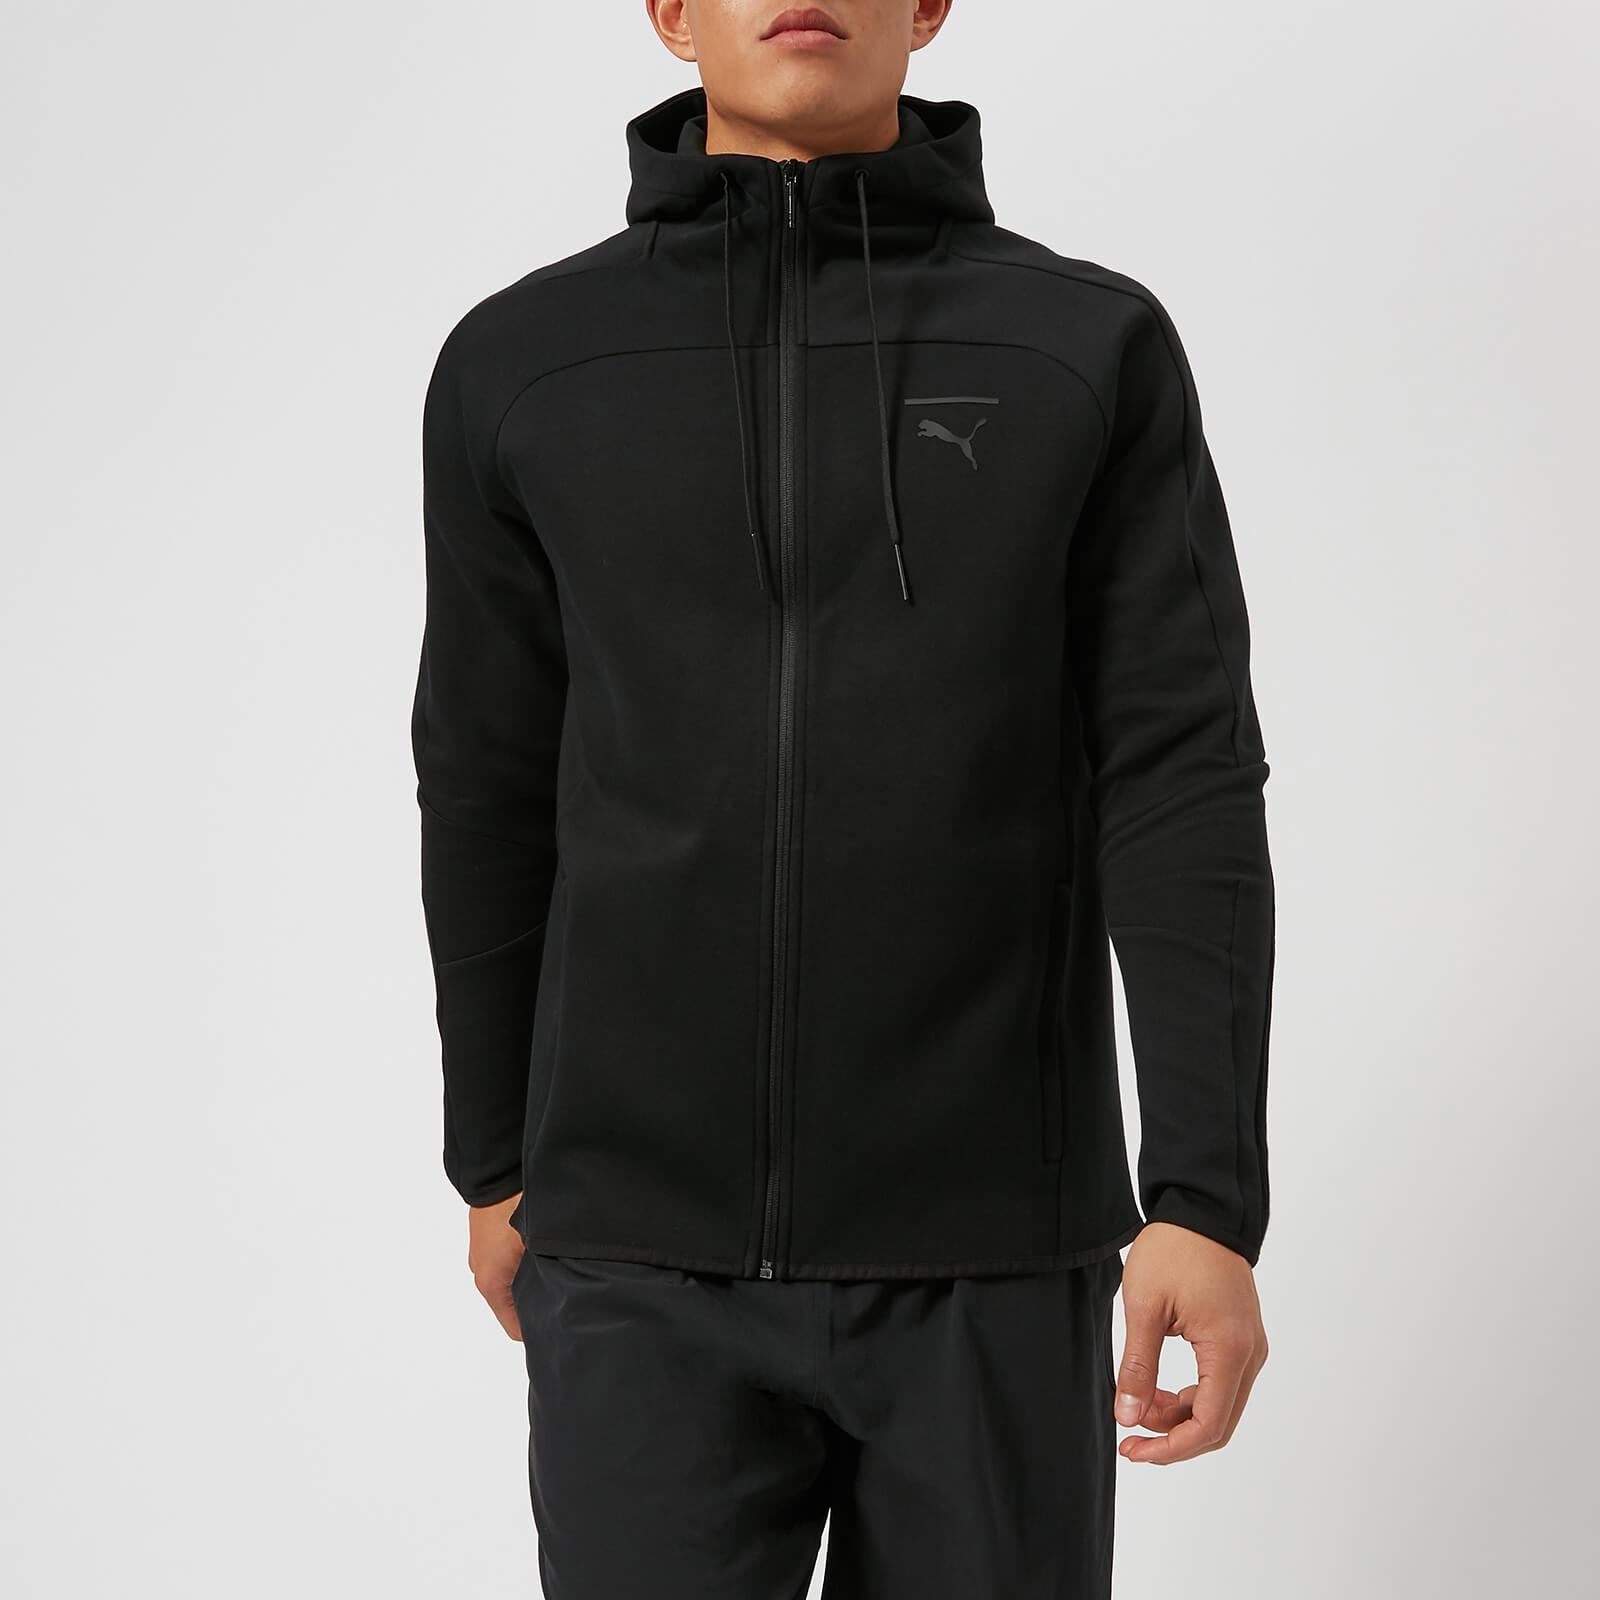 e75e11e42b PUMA Pace Primary Full Zip Hoody in Black for Men - Lyst